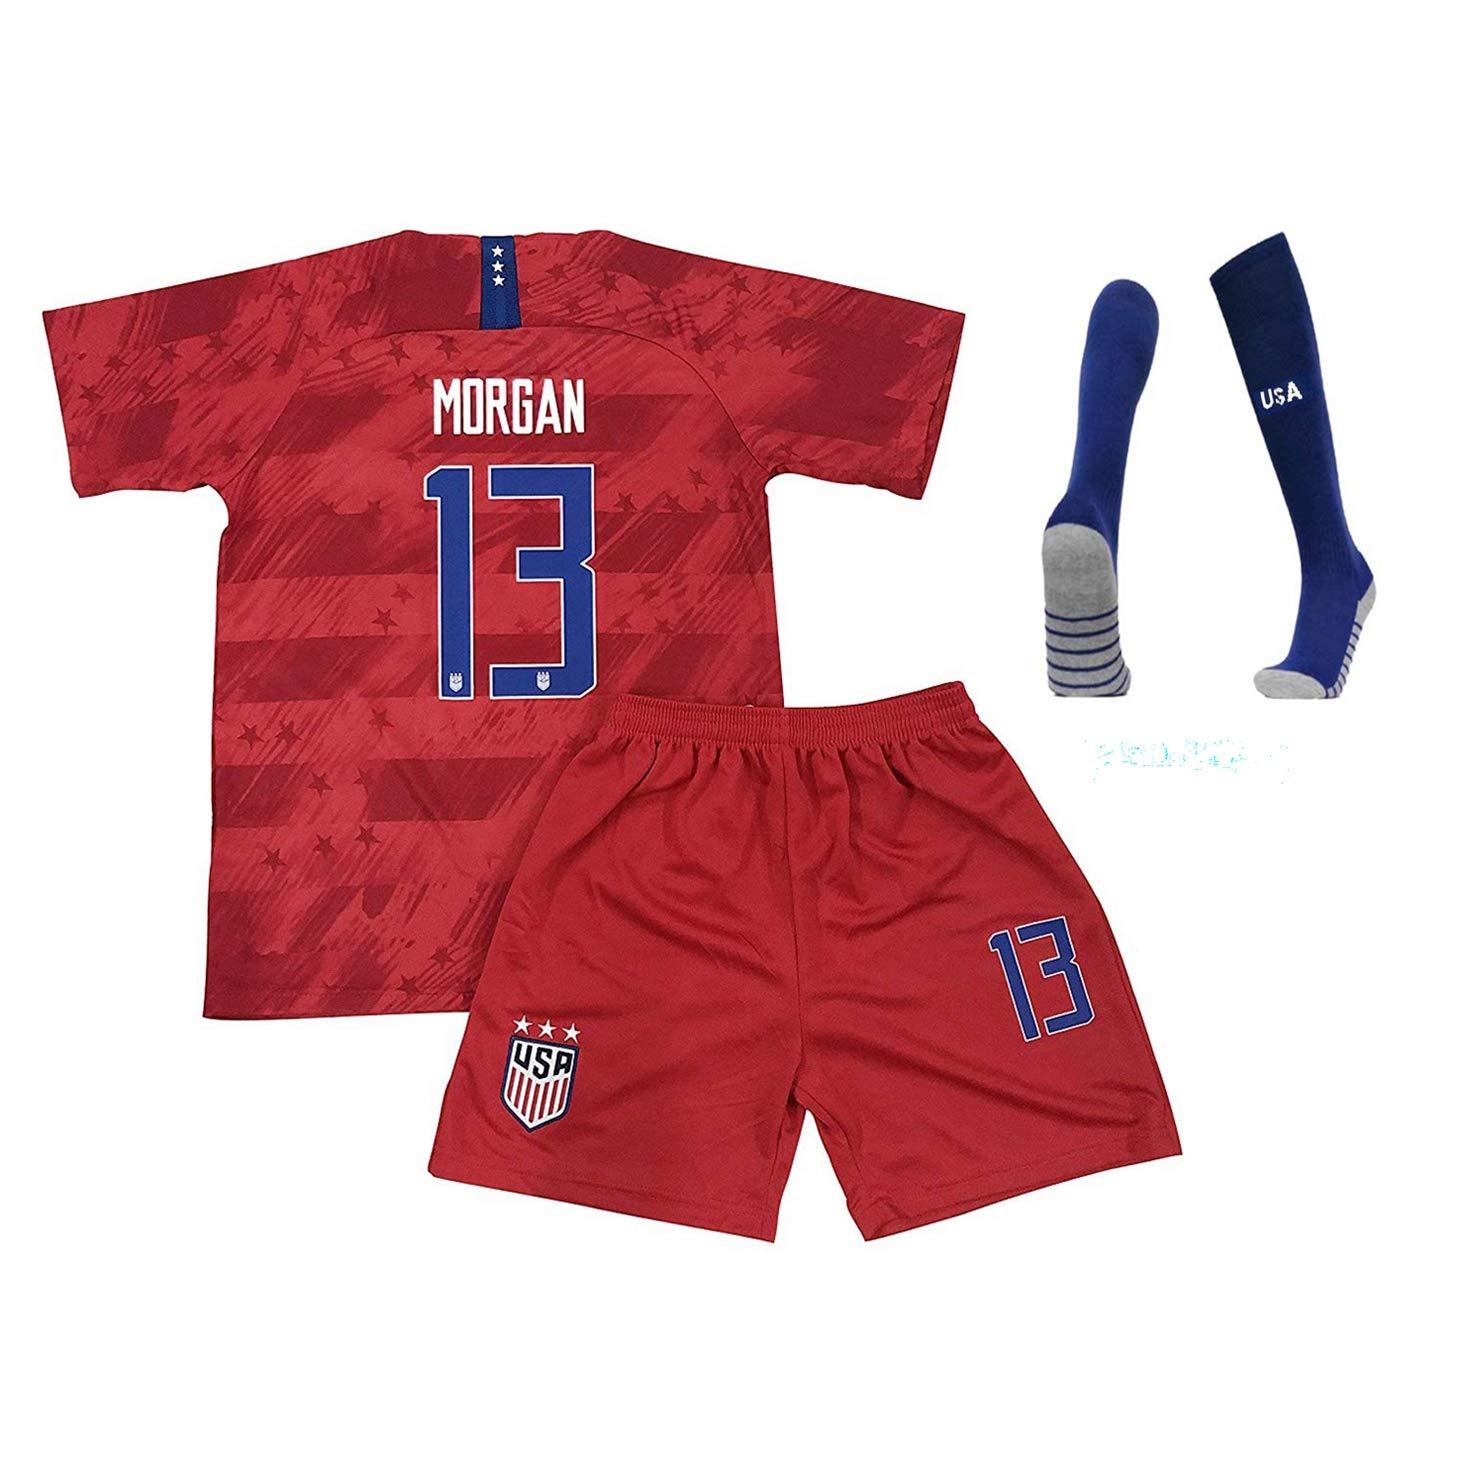 Alex Morgan 13 USA Youth/Kid 20season Home/Away T-Shirt Socks (Red, 22) by Shenyizhu